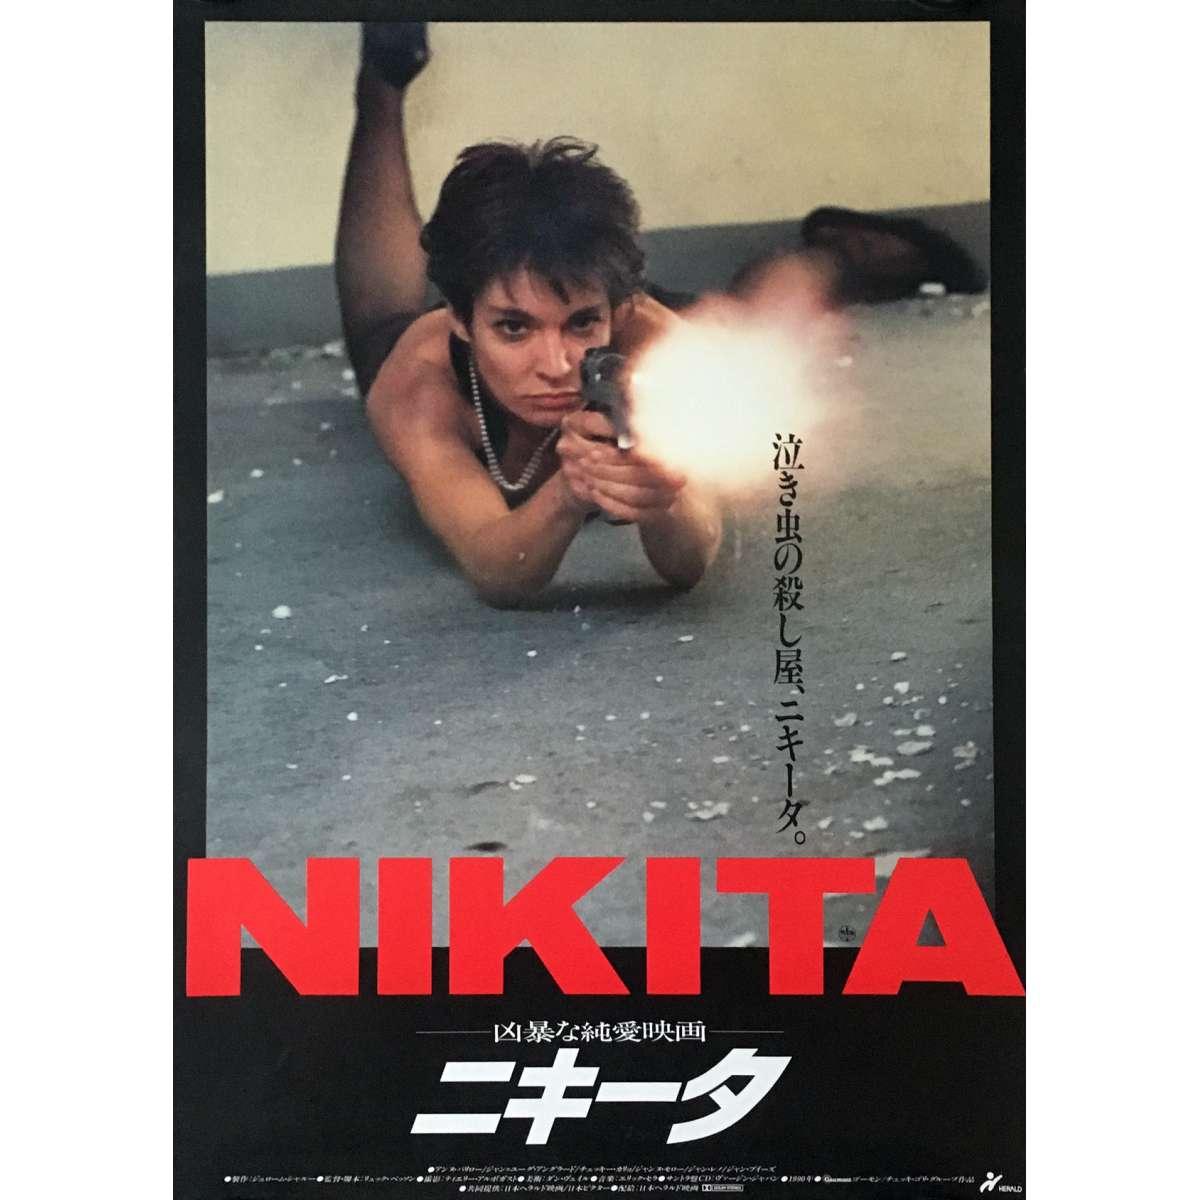 la-femme-nikita-japanese-movie-poster-19